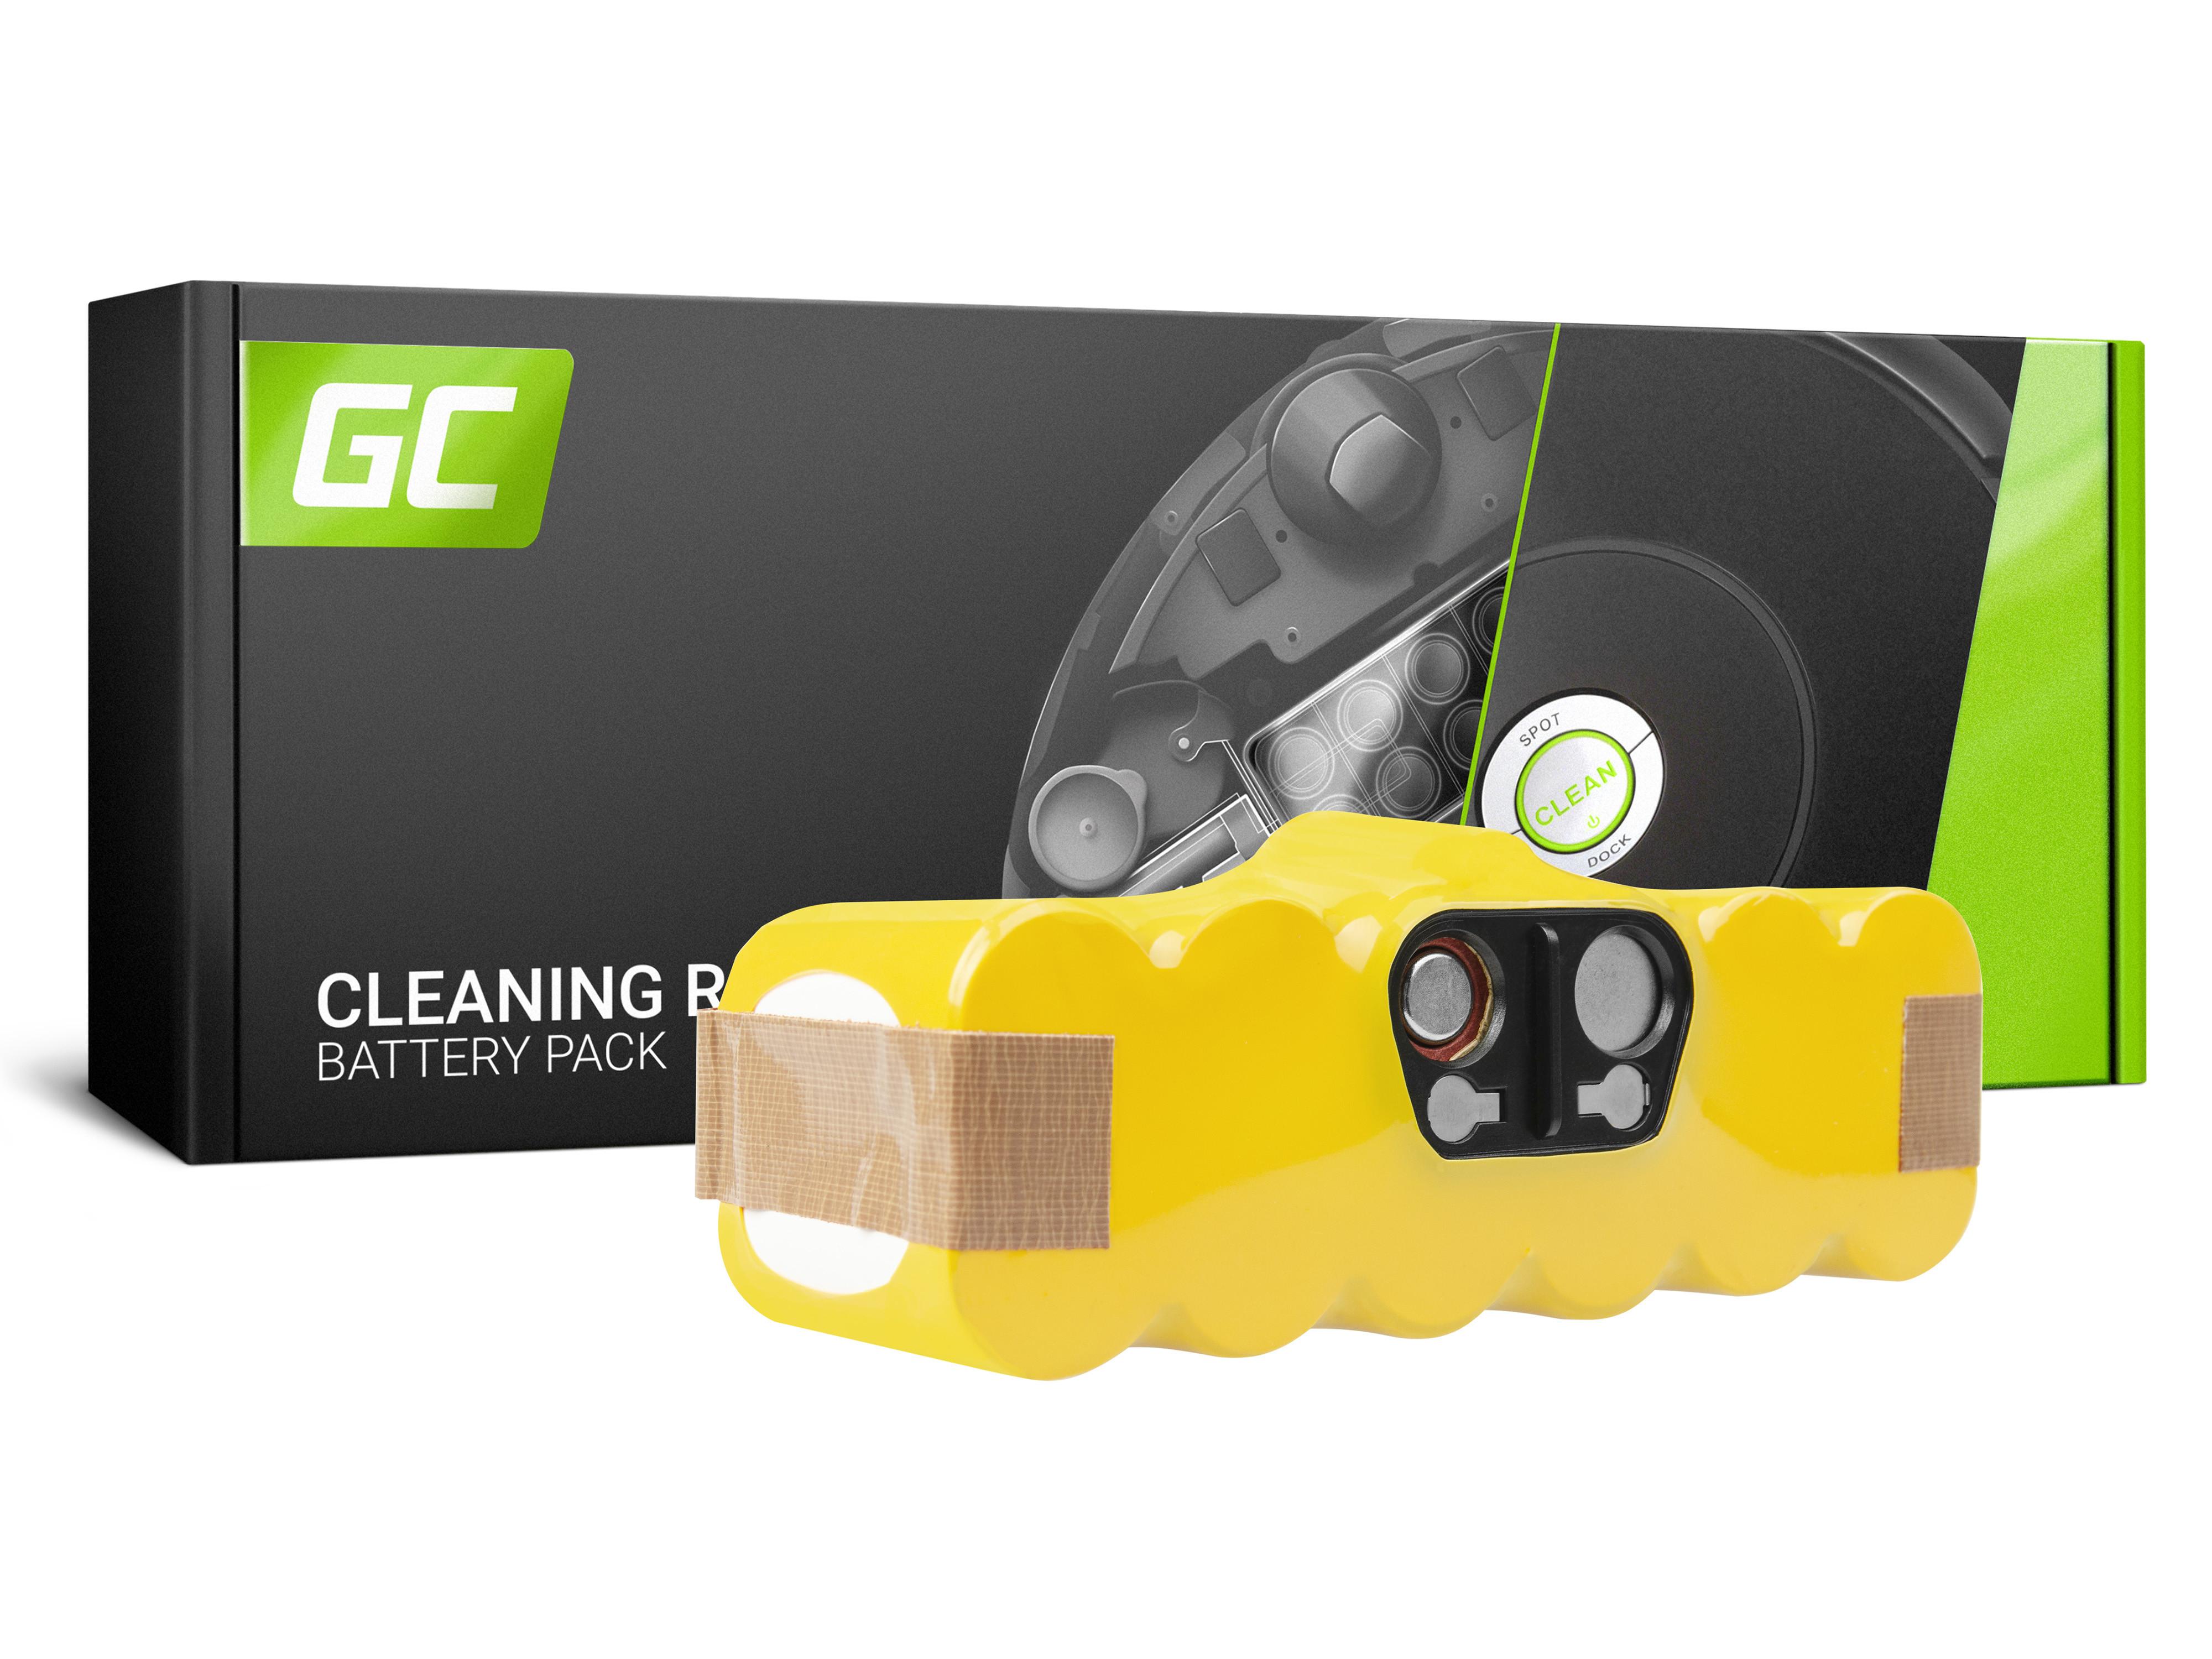 Baterie Green Cell iRobot Roomba 80501 510 530 540 550 560 570 580 610 620 625 760 770 780 14.4V 3000mAh Ni-MH – neoriginální